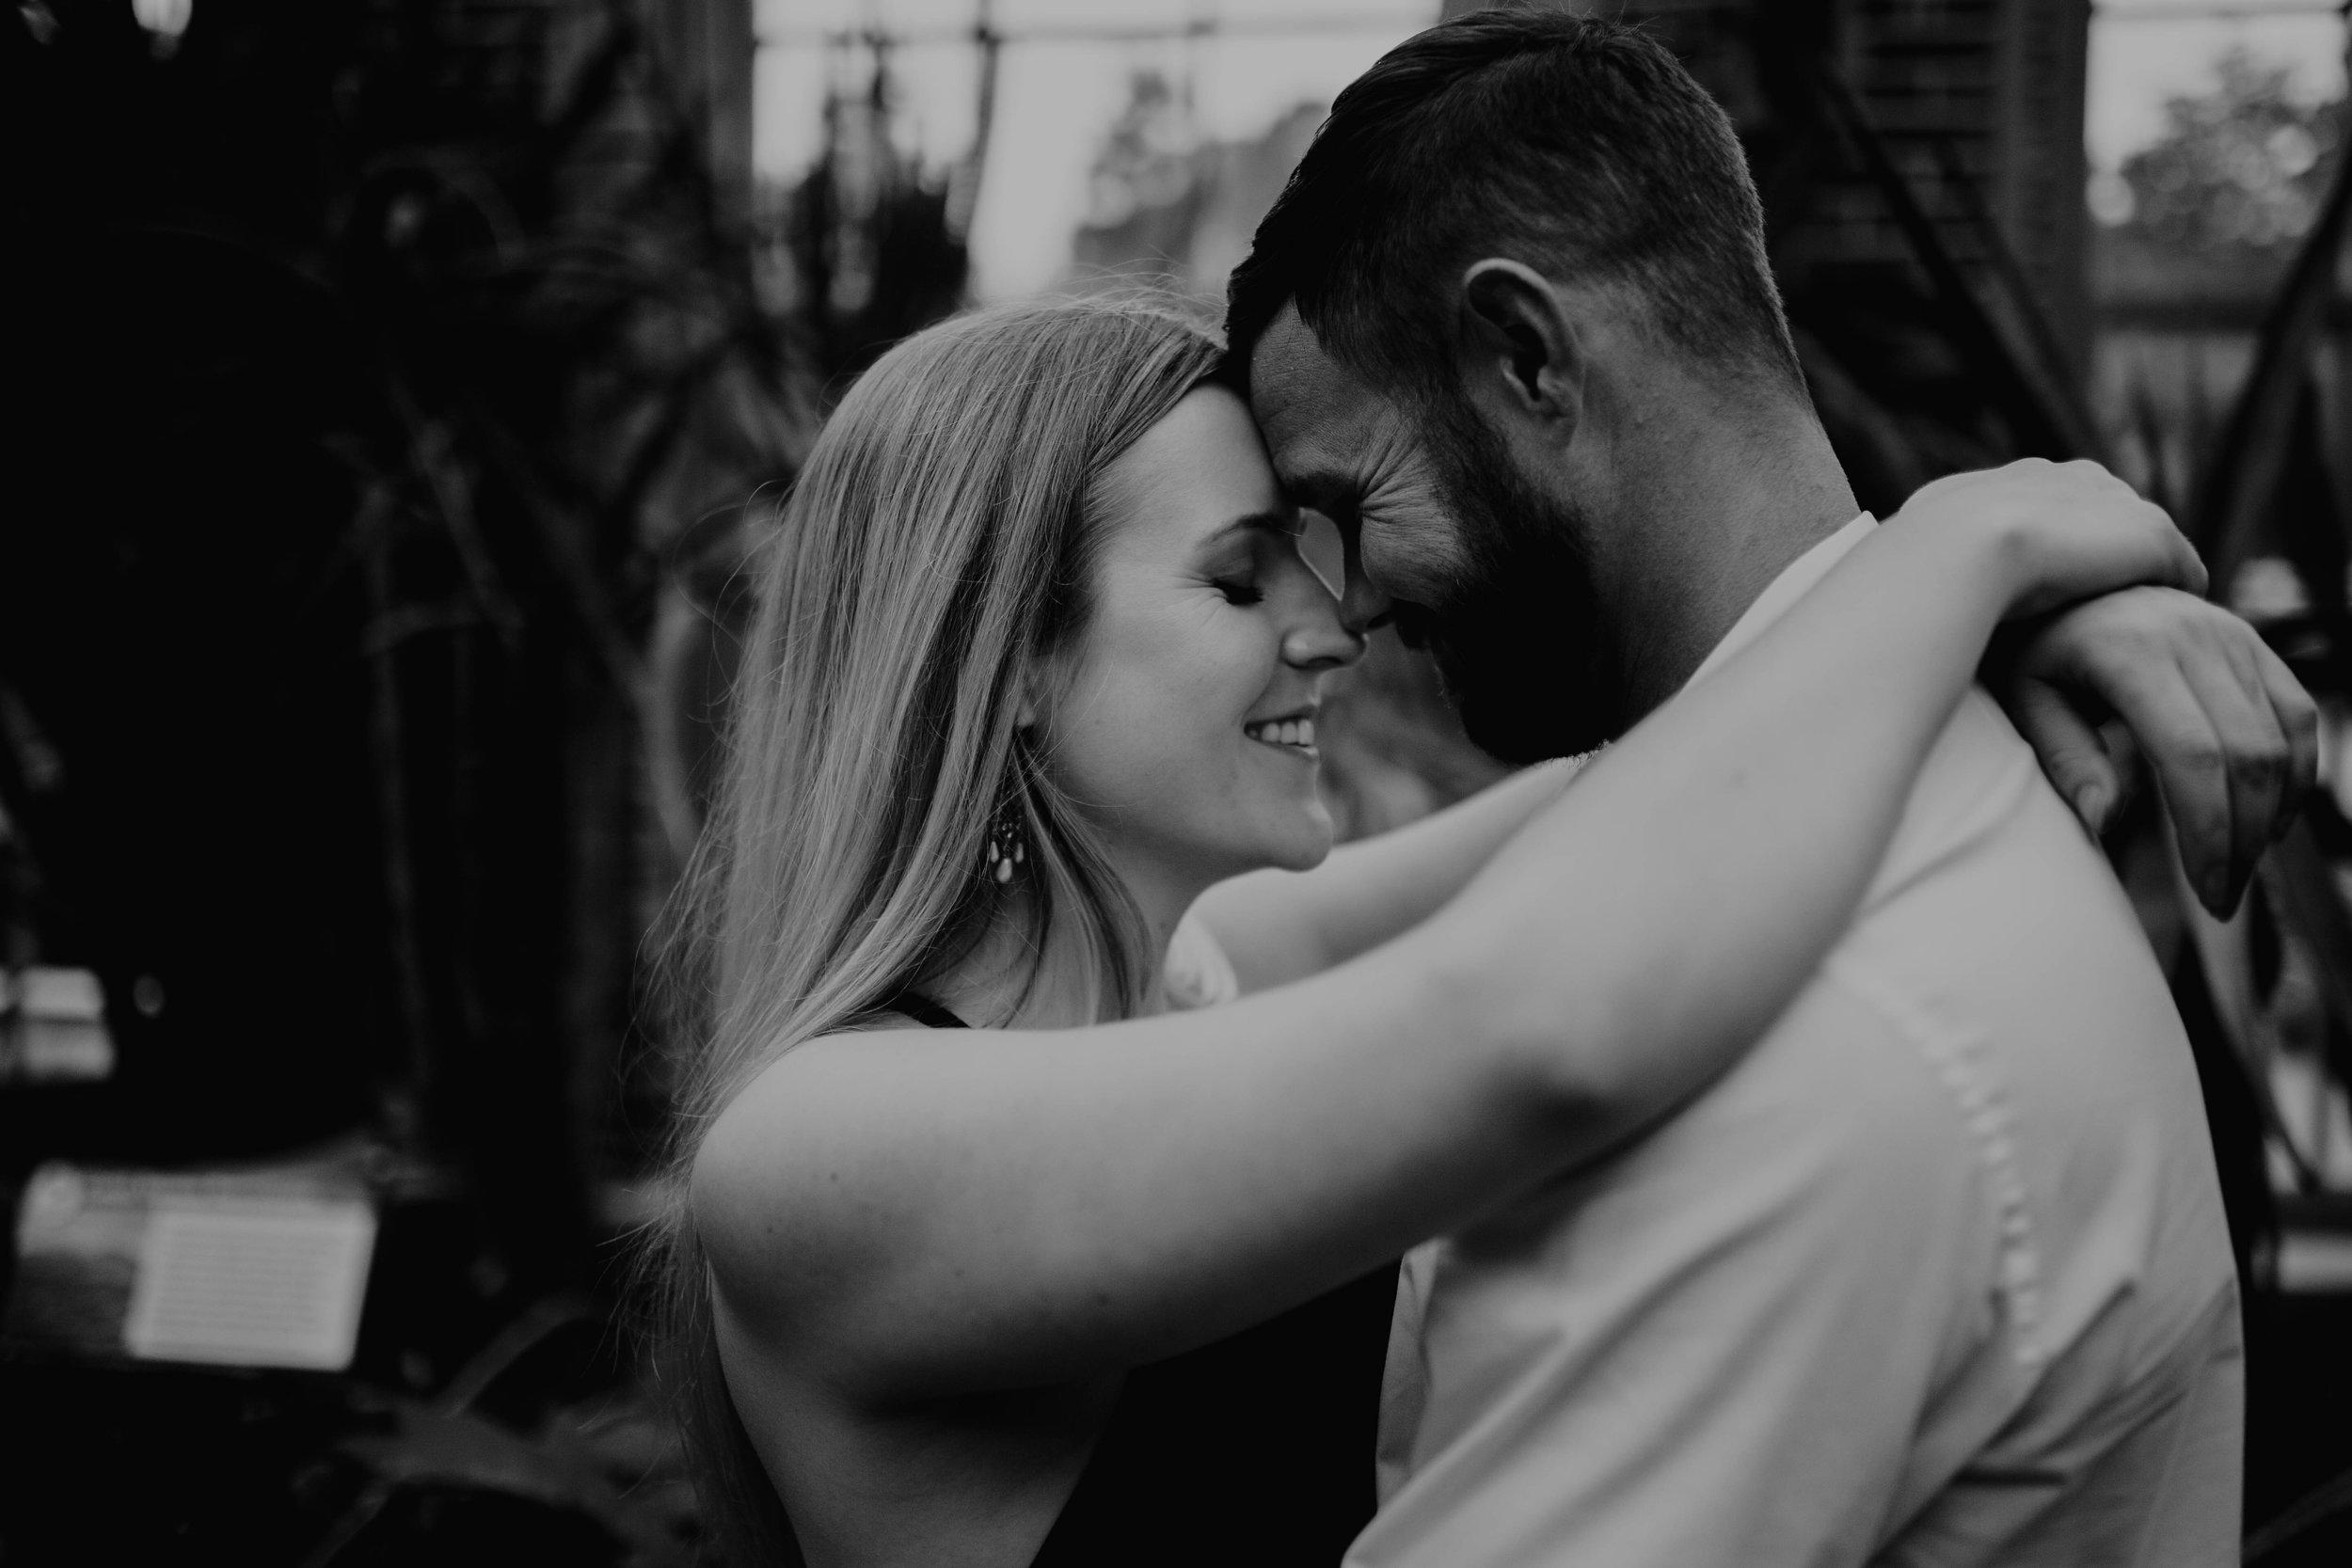 Romantic, intimate, adventurous St. Louis, Missouri engagement